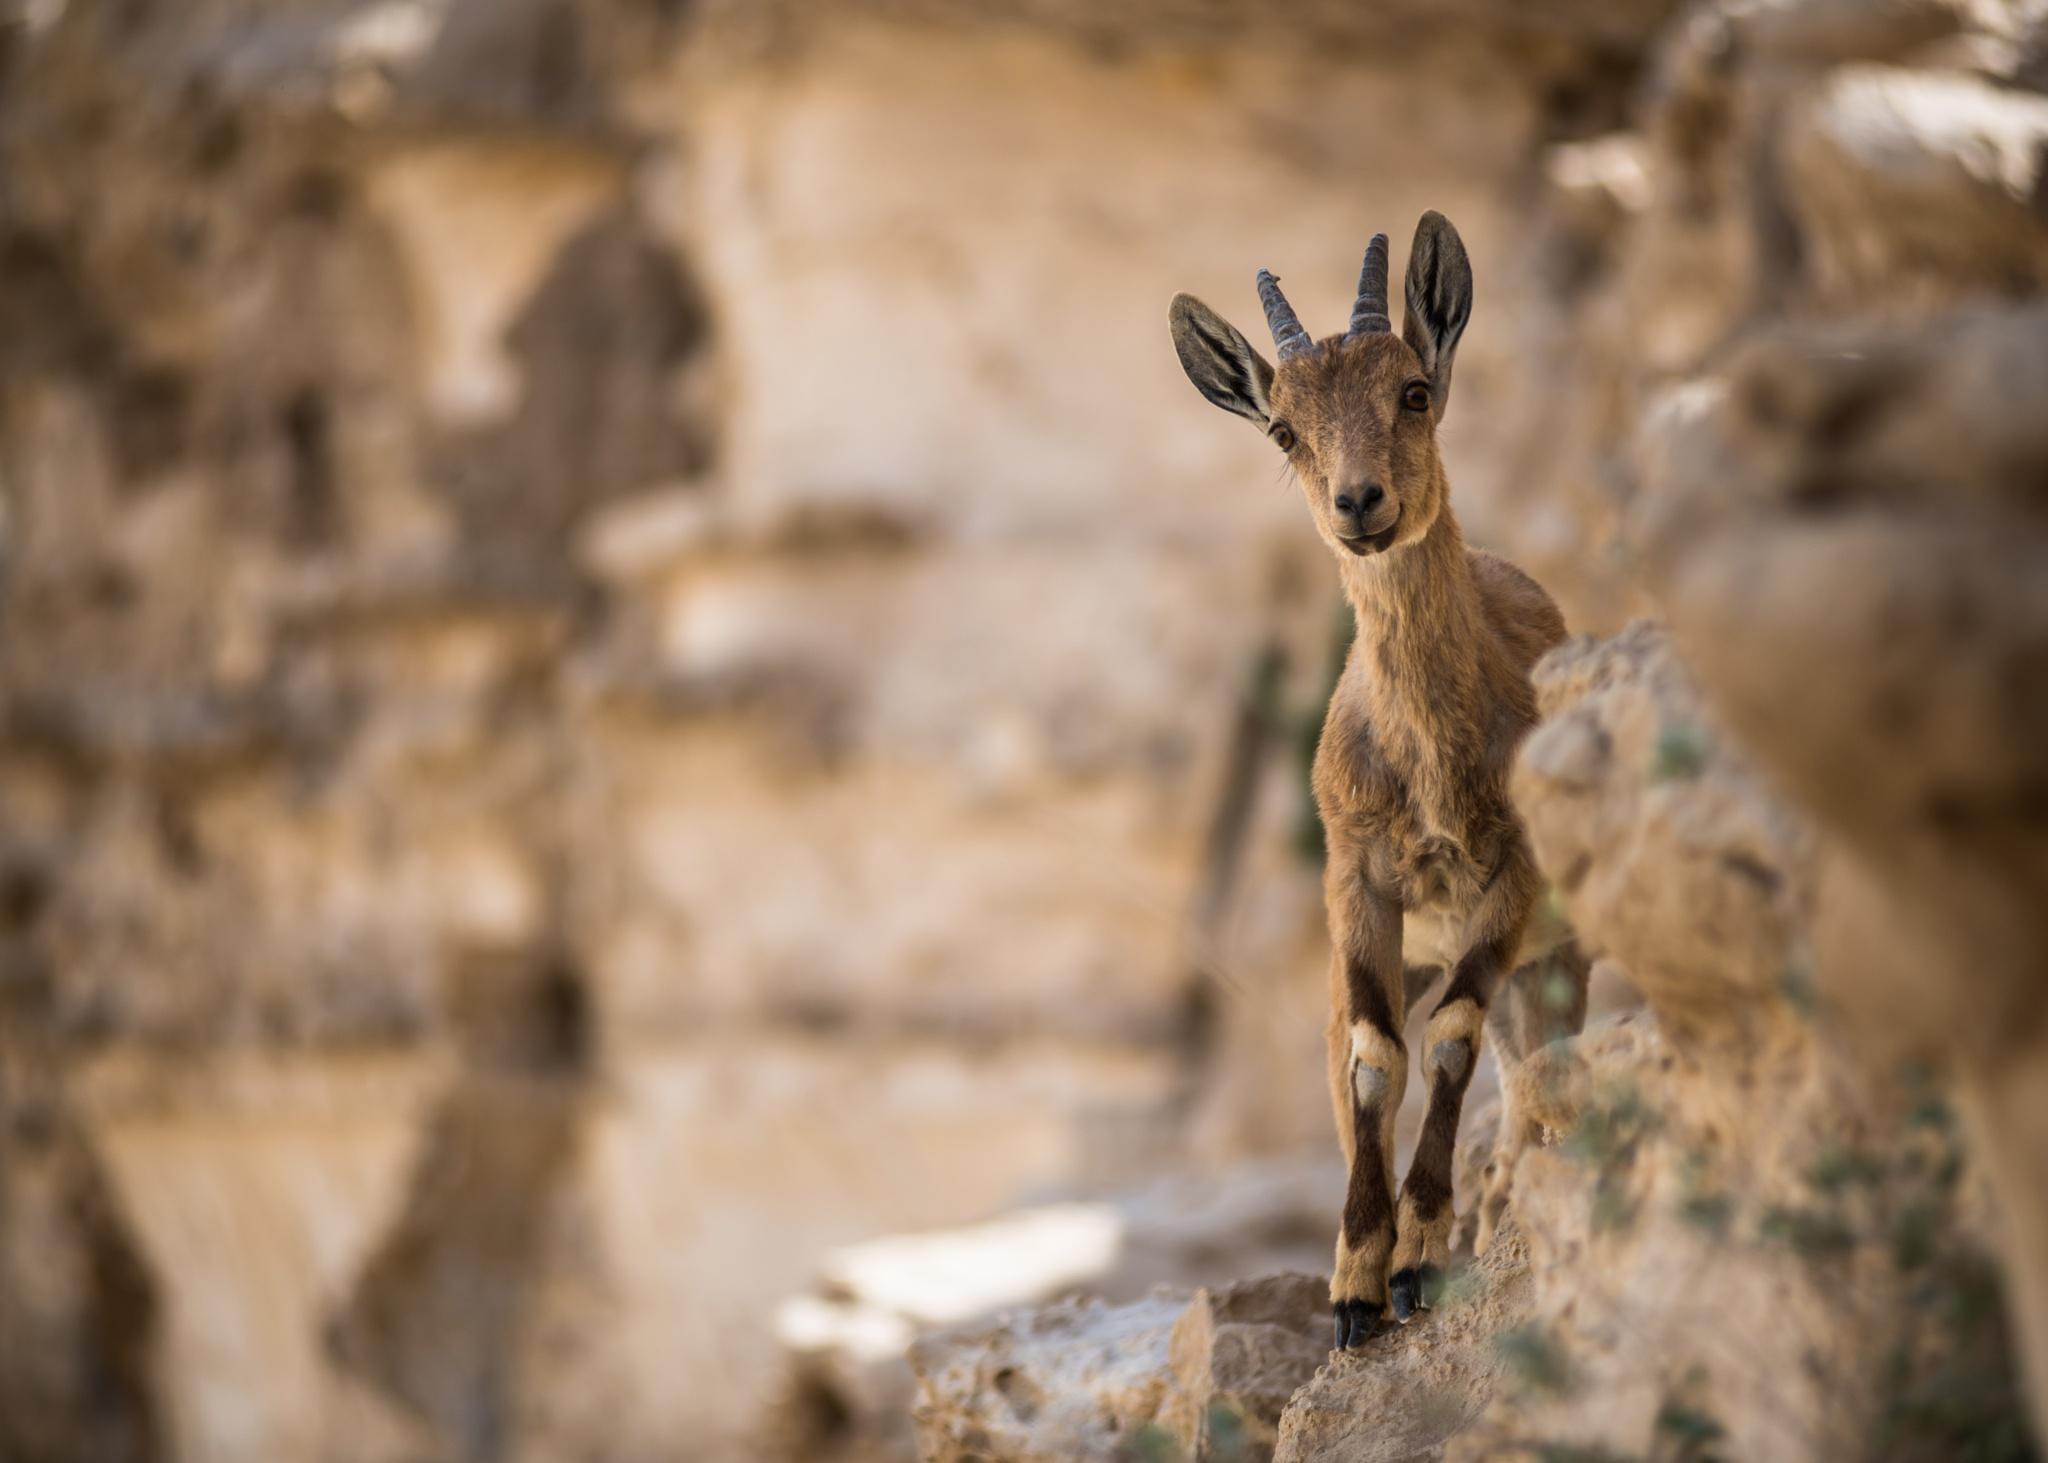 Desert life by Tomasz Solinski